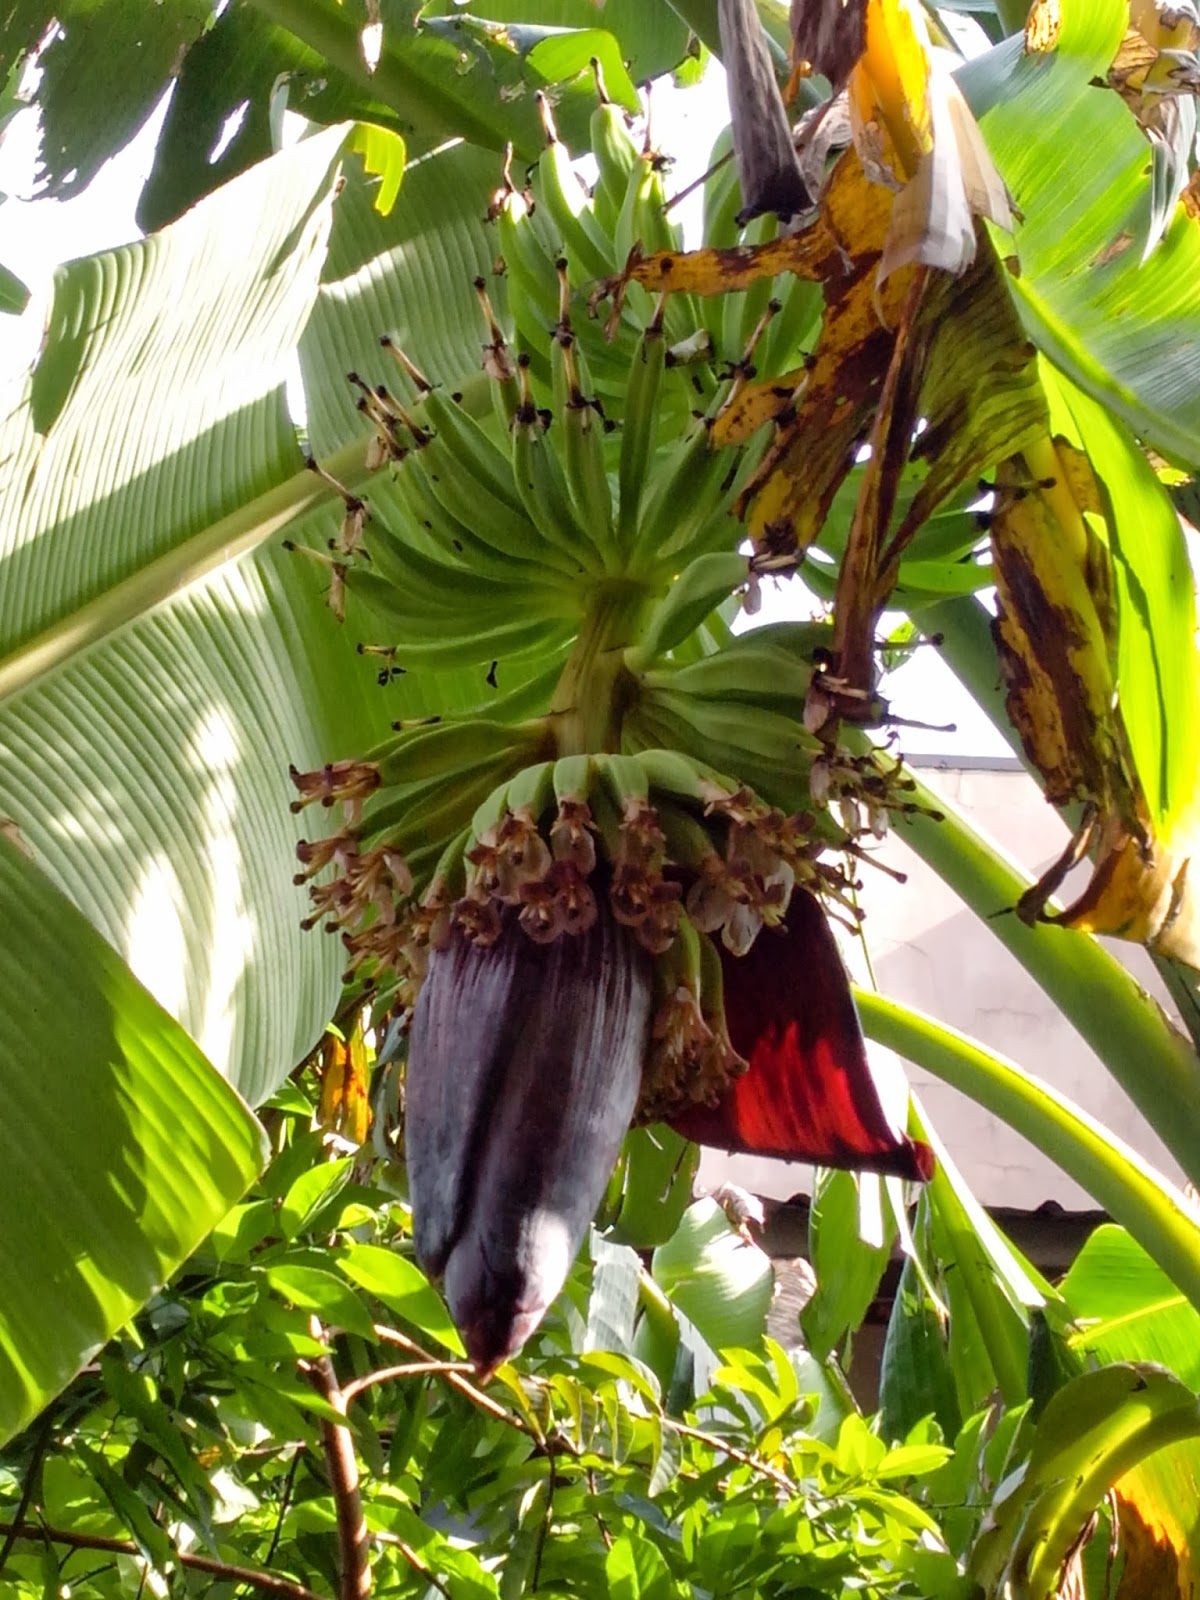 invitation to smell the flowers Banana Blossom